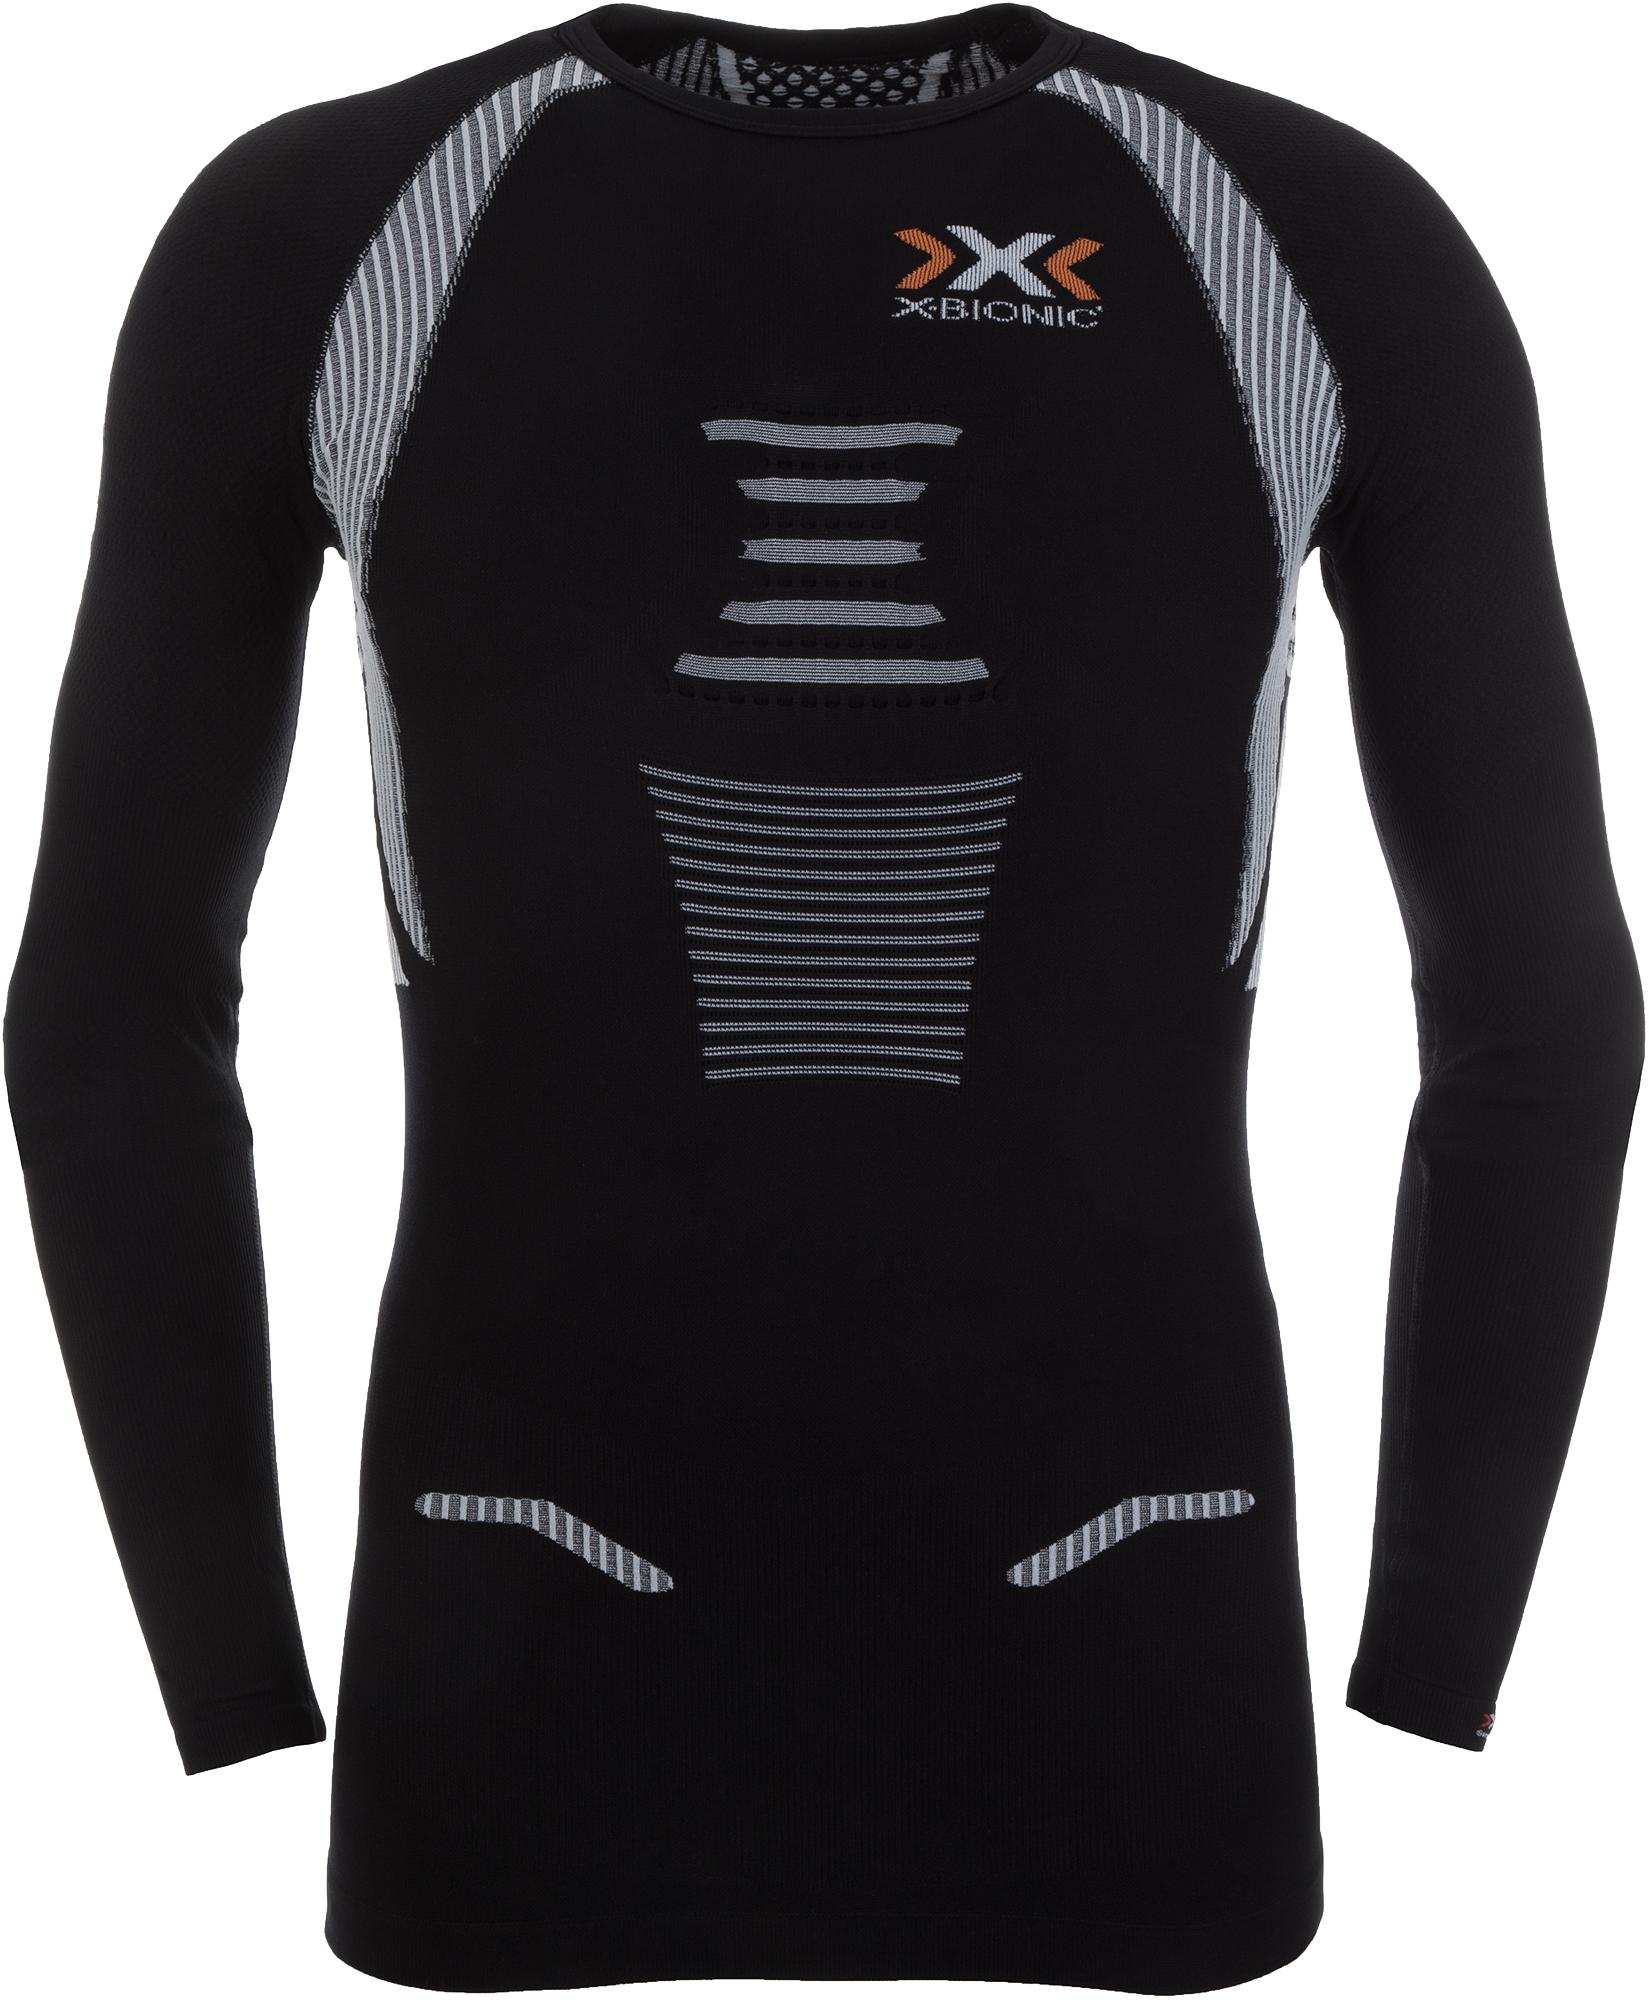 X-Bionic Футболка с длинным рукавом мужская X-Bionic The Trick Ow, размер 54 футболка x bionic x bionic effektor running powershirt®